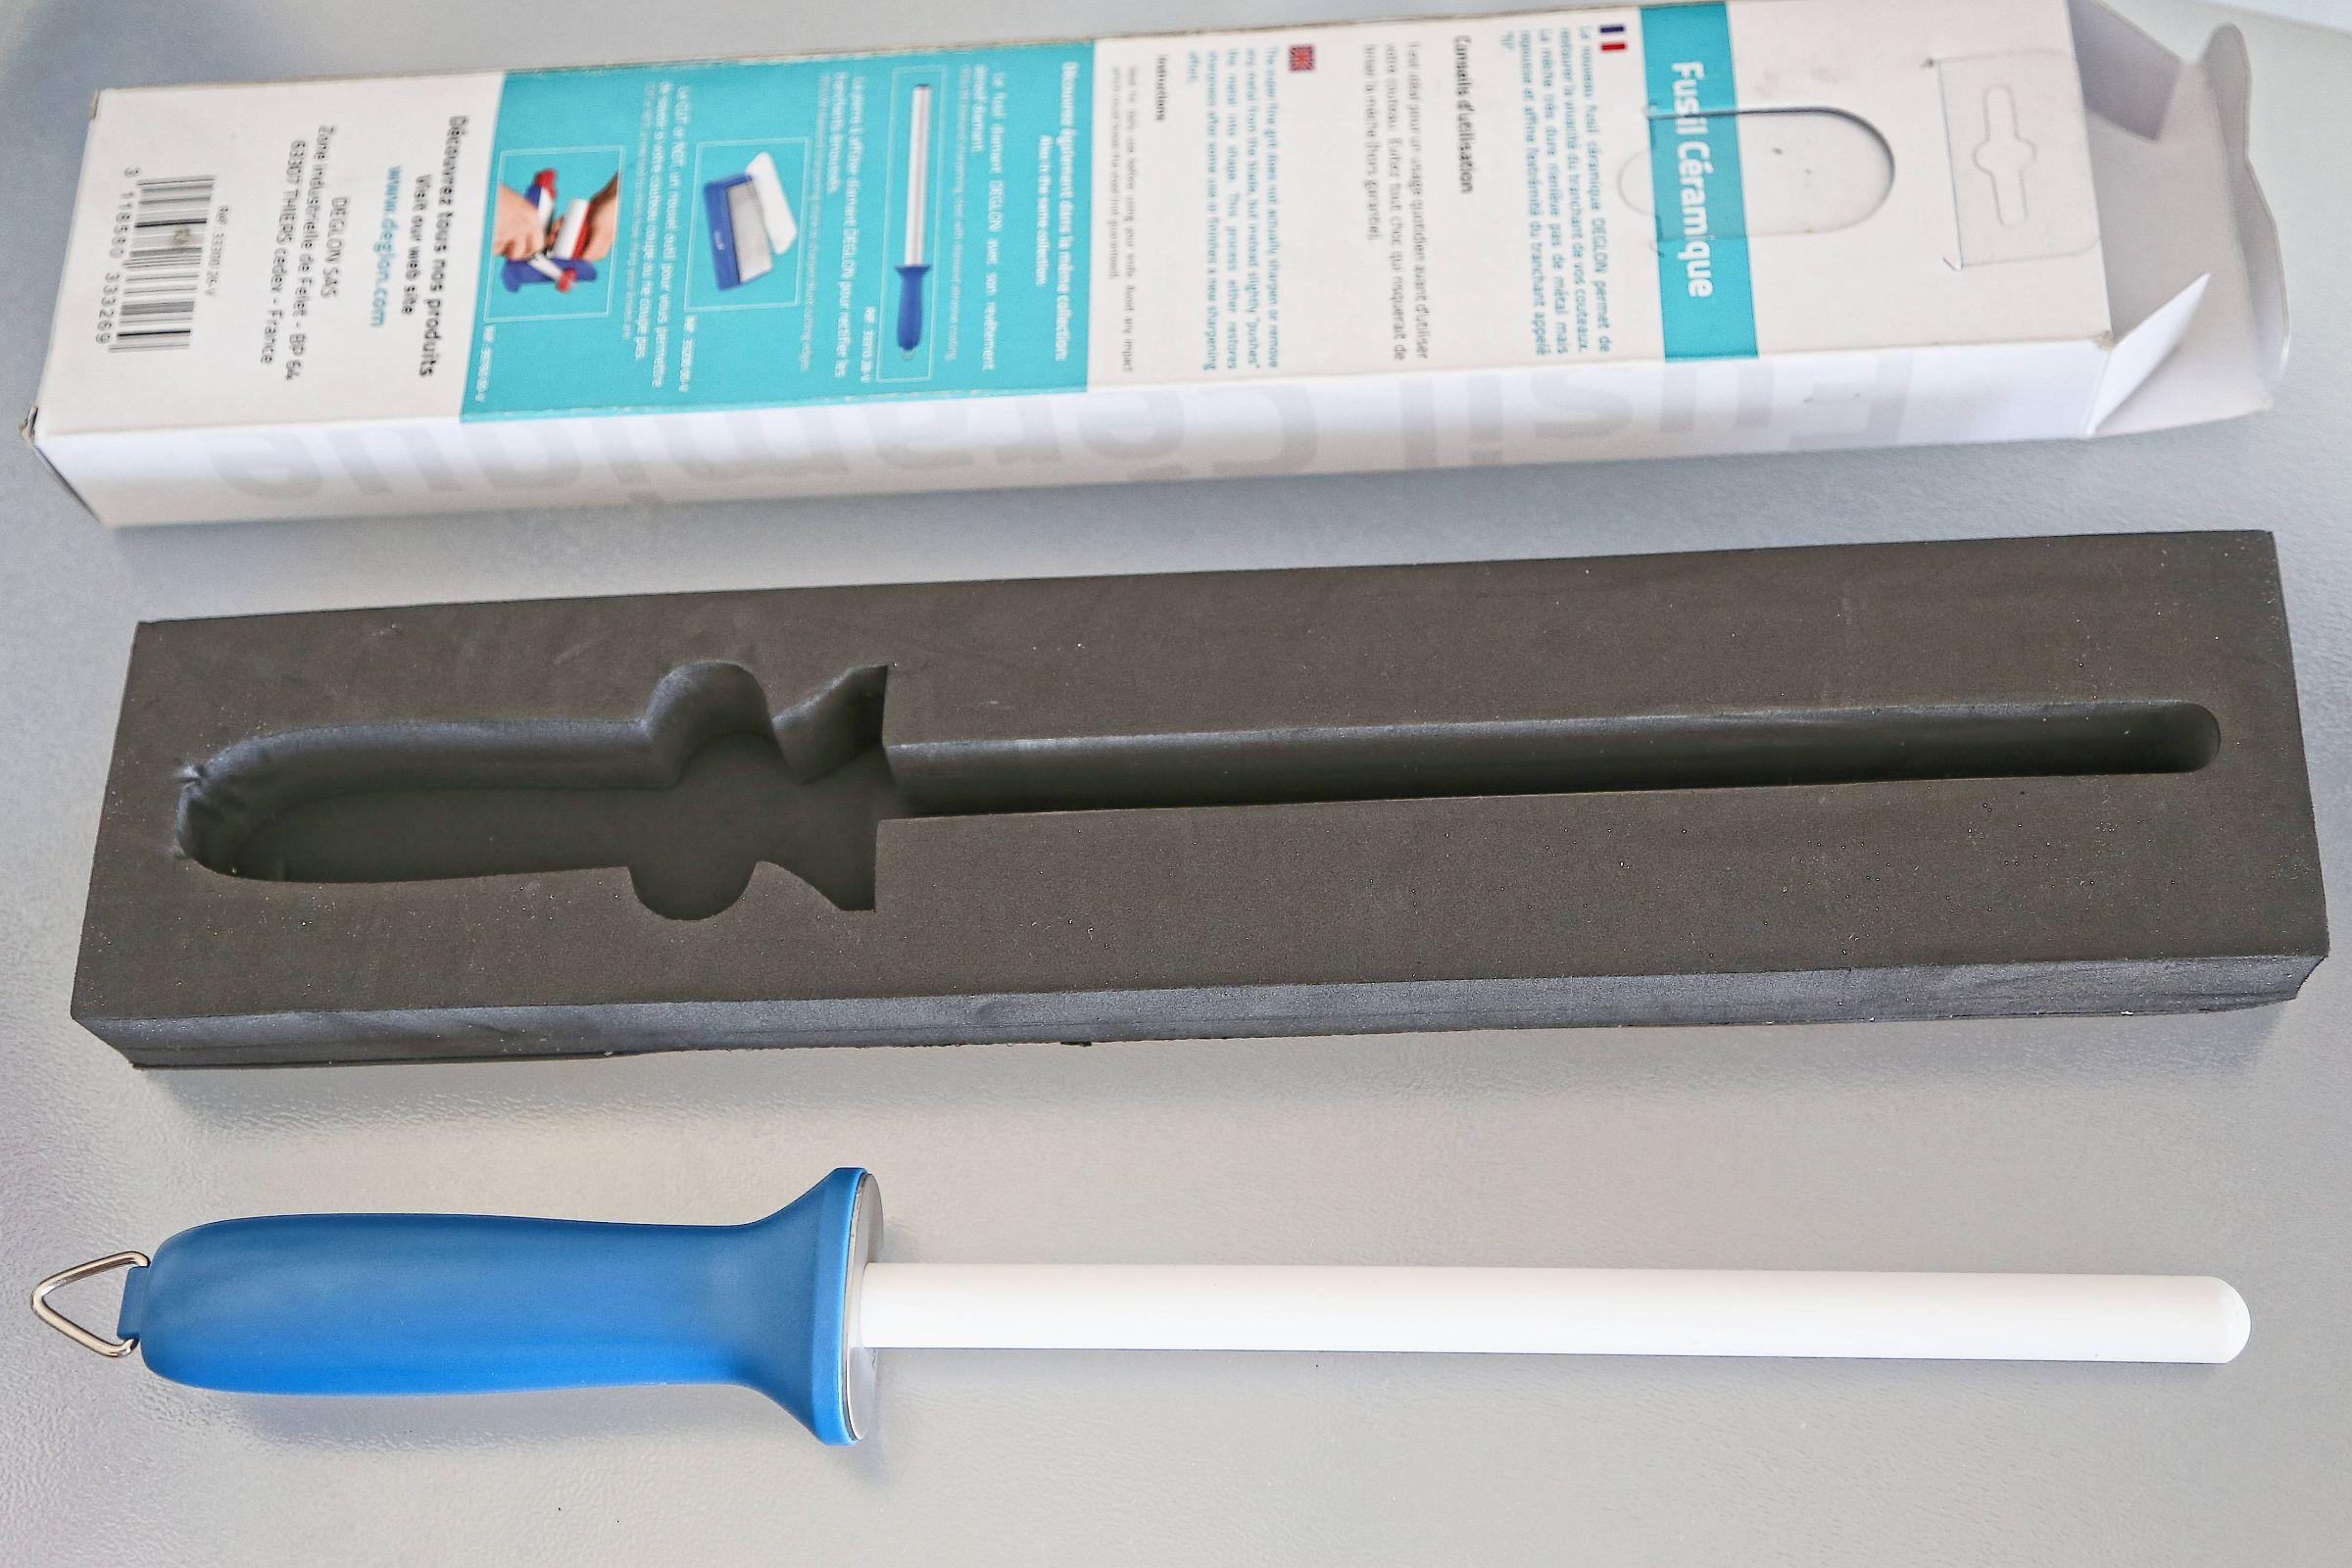 Deglon Ceramics Knife Sharpener, 9-Inch